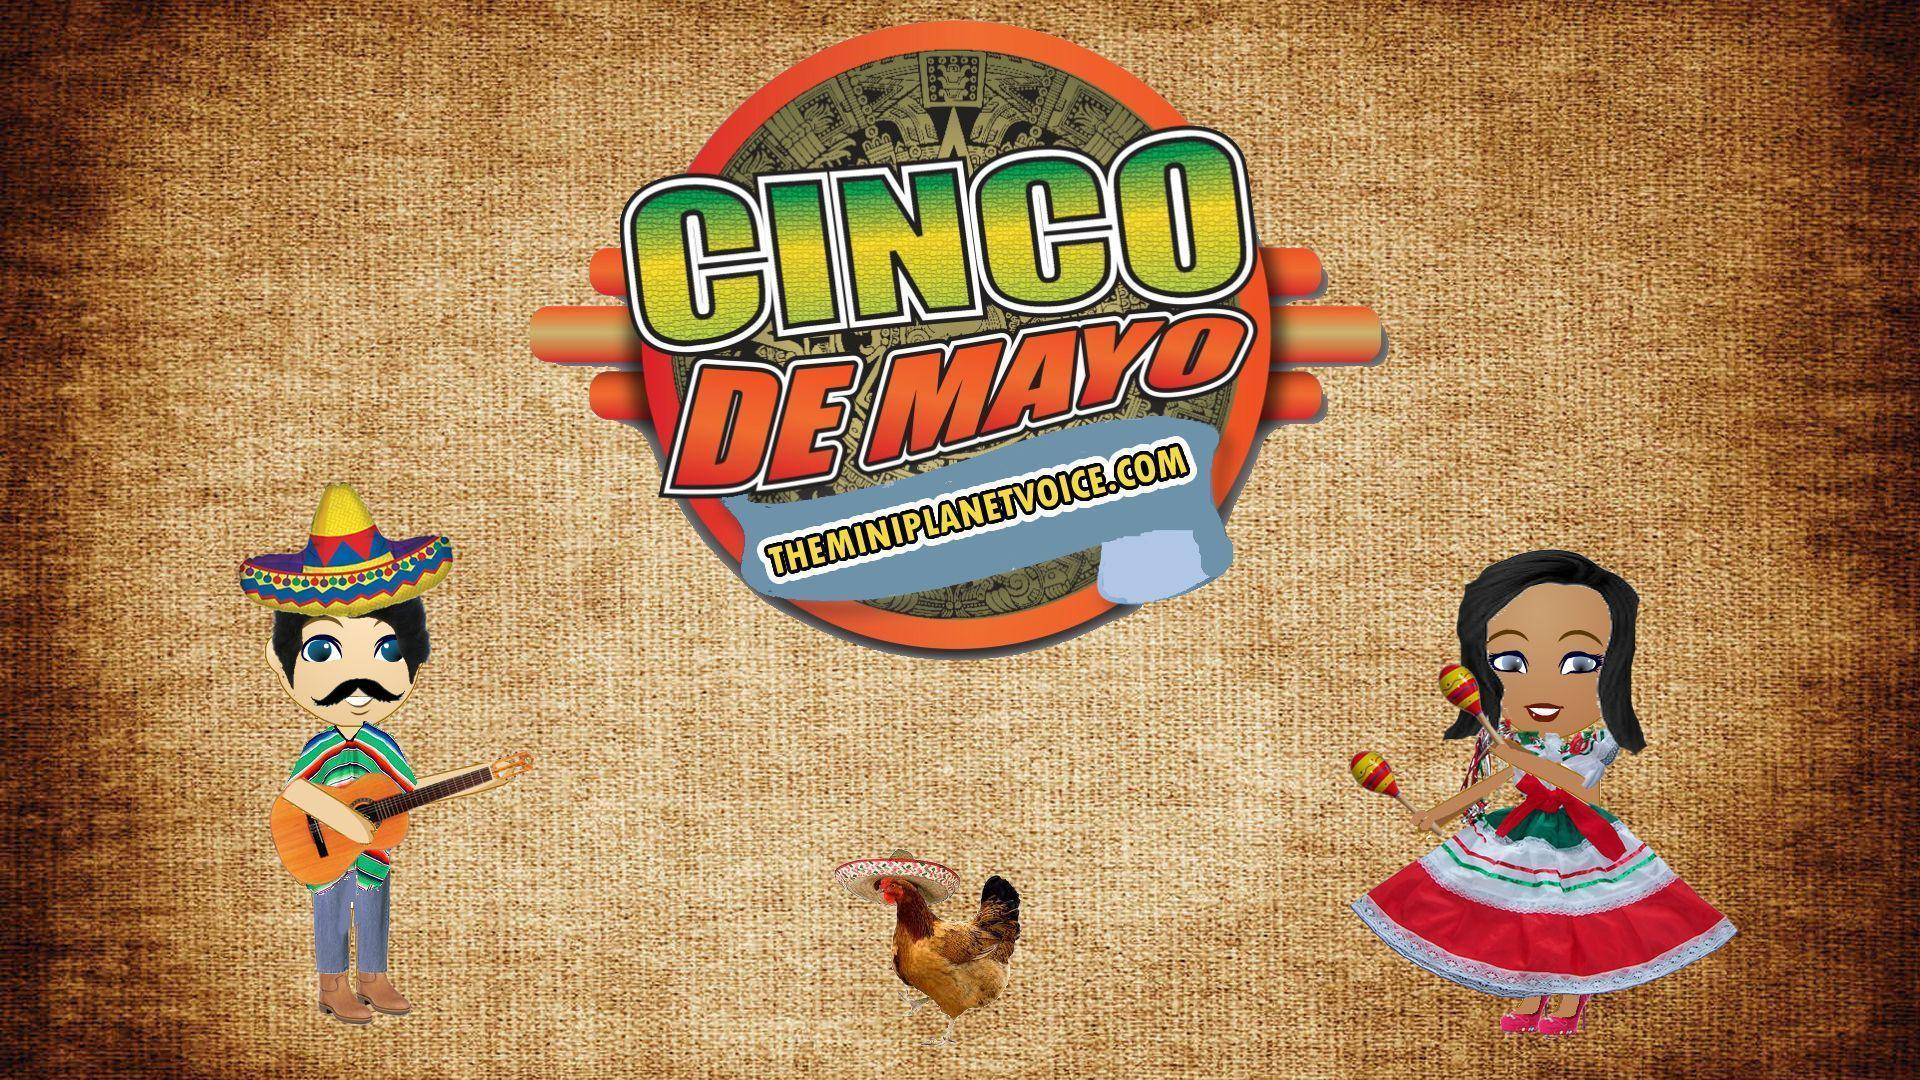 13 Cinco De Mayo 2014 Greeting Wallpaper - Educational Entertainment